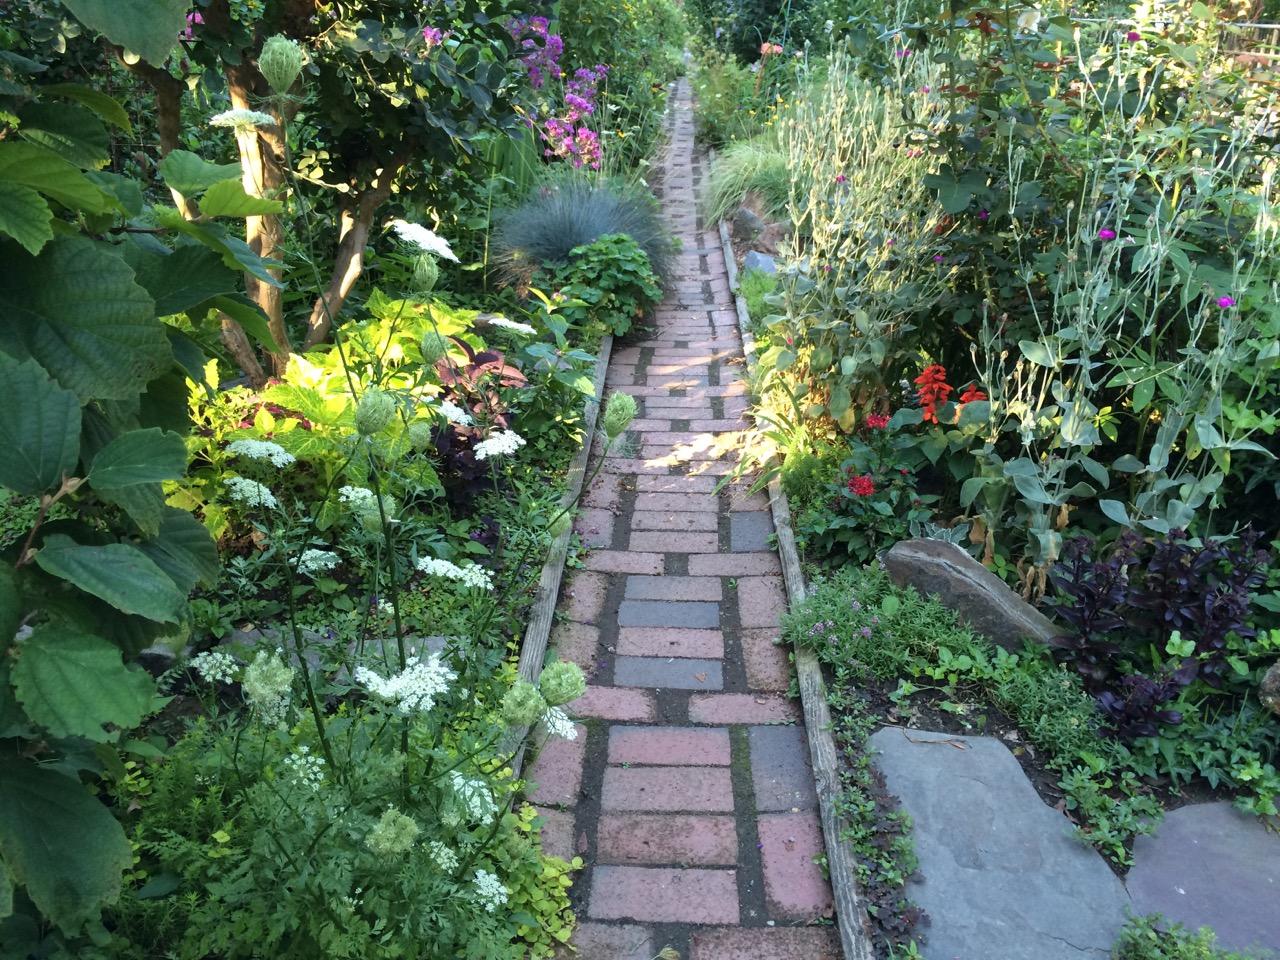 thegoodgarden|davidcalle|riversidepark|gardenpeople_3952.jpg